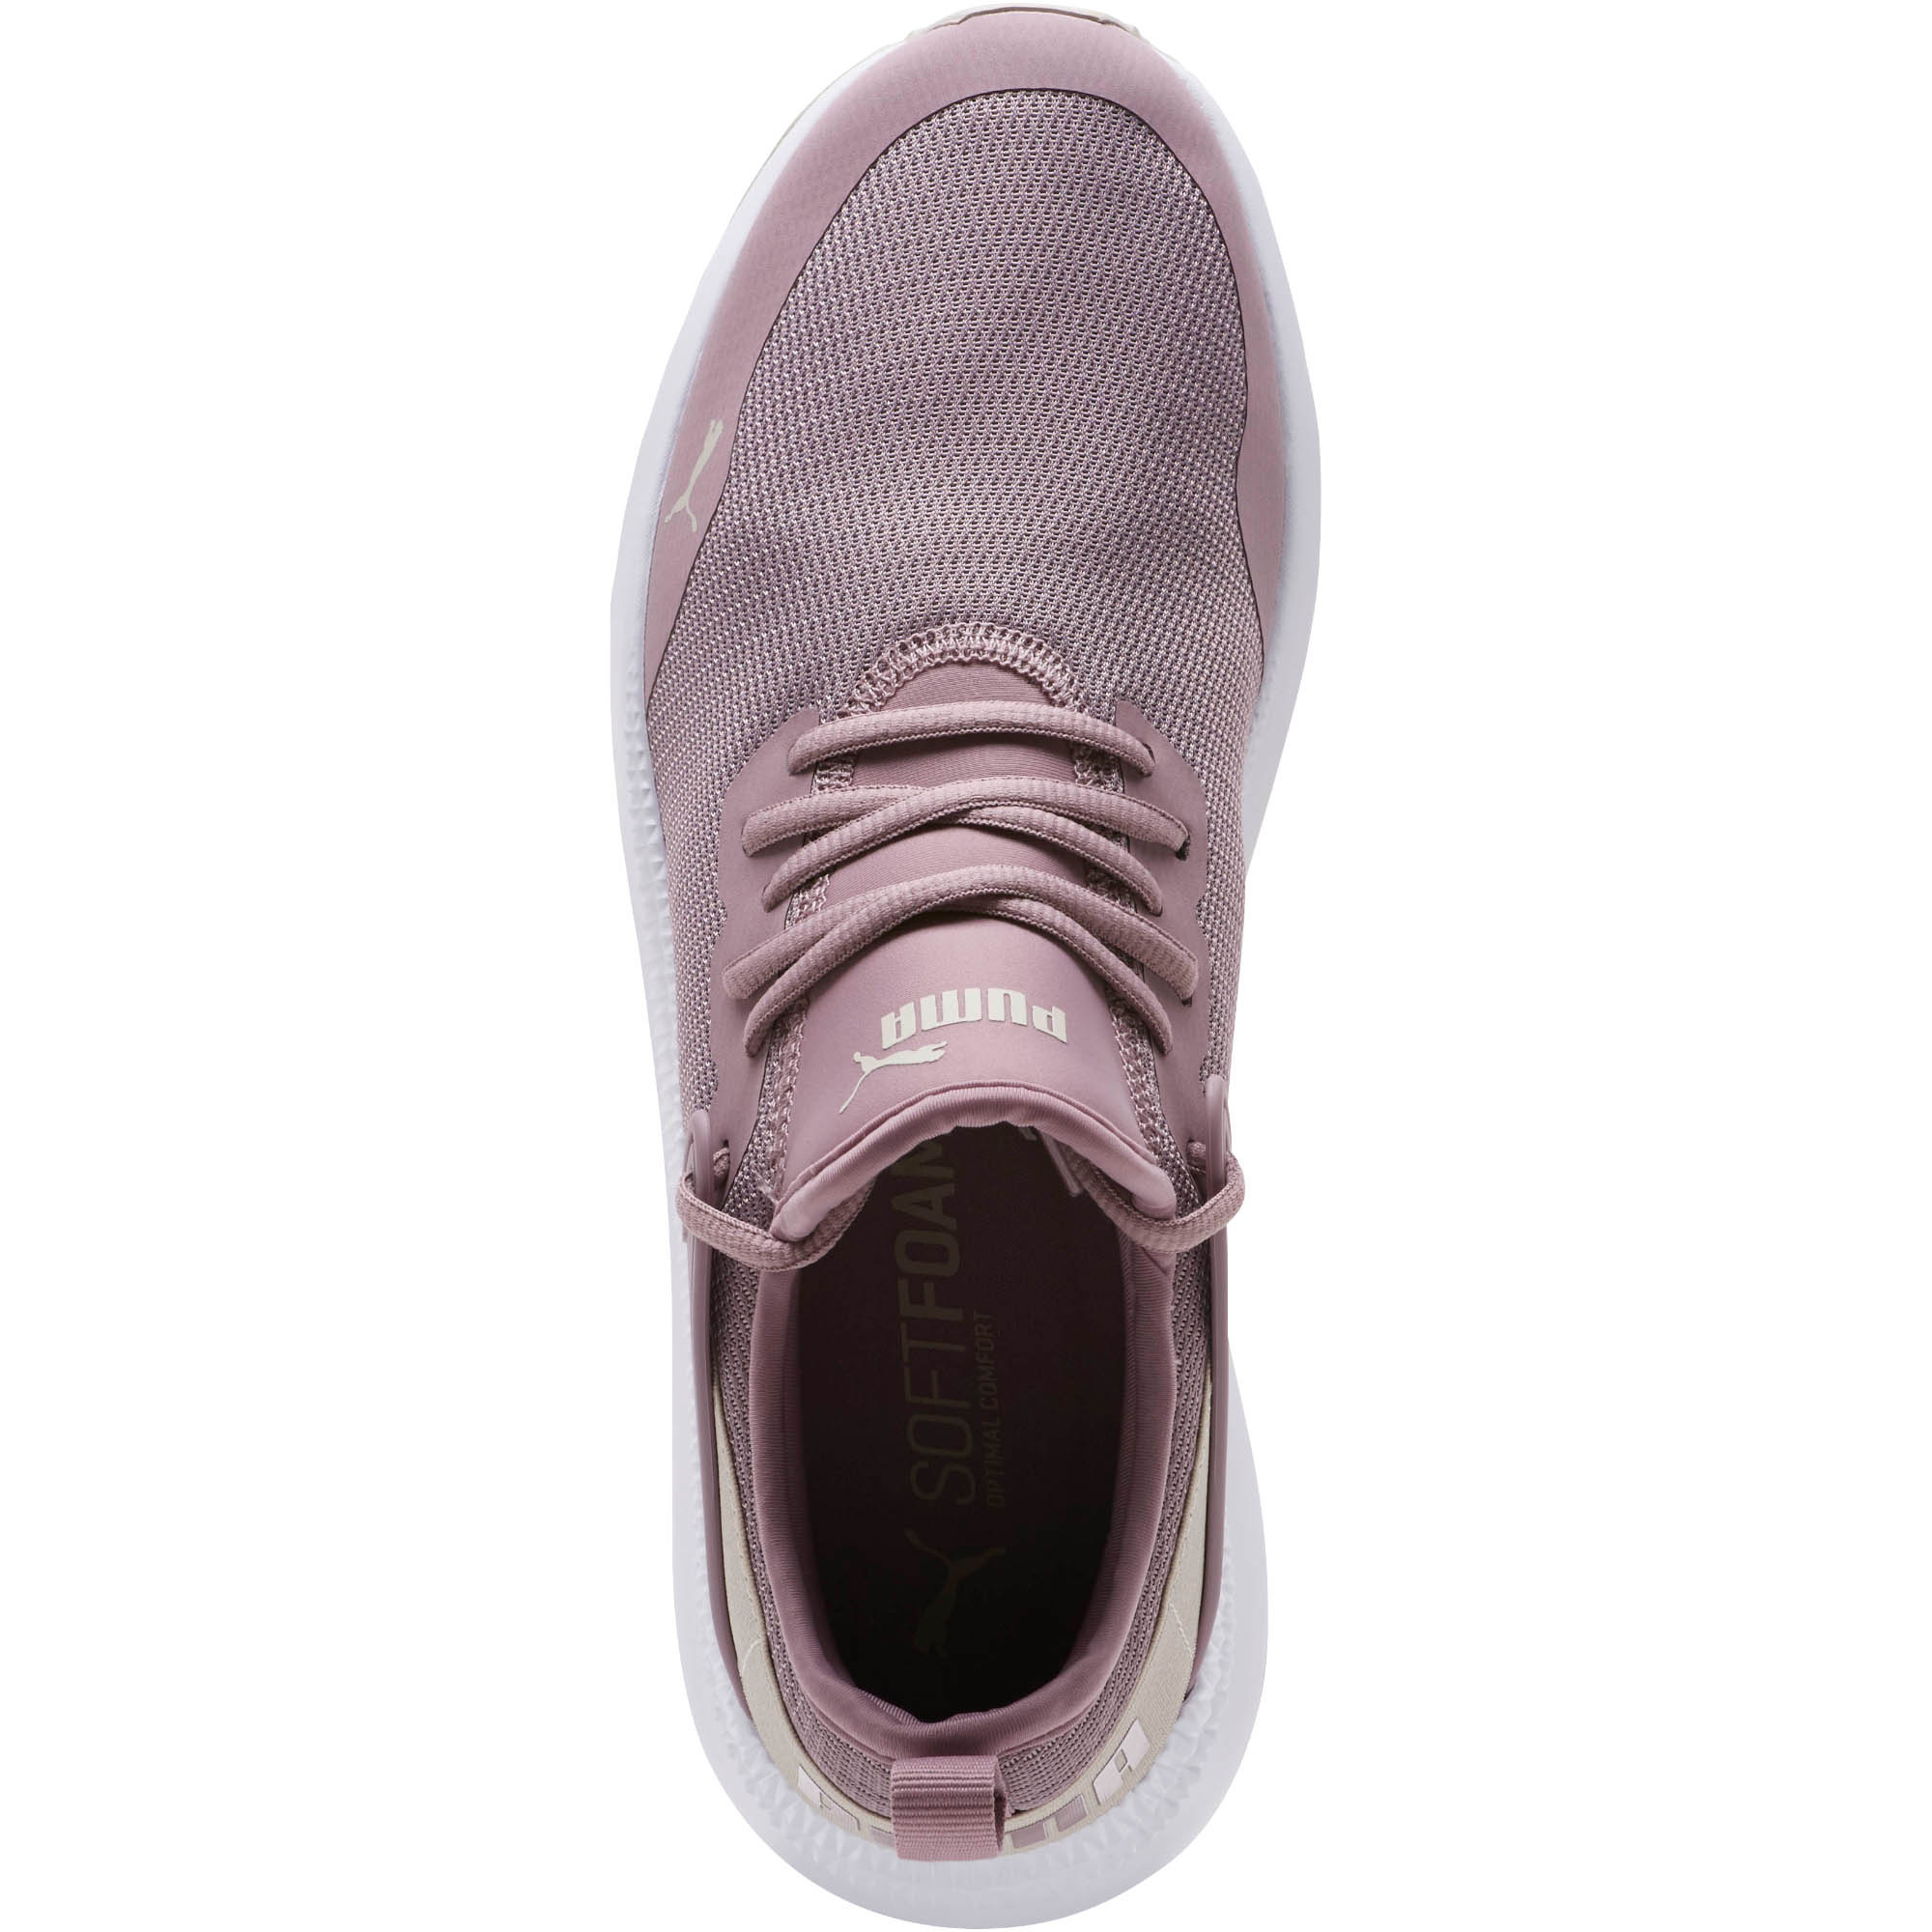 PUMA-Pacer-Next-Cage-Sneakers-Men-Shoe-Basics thumbnail 21